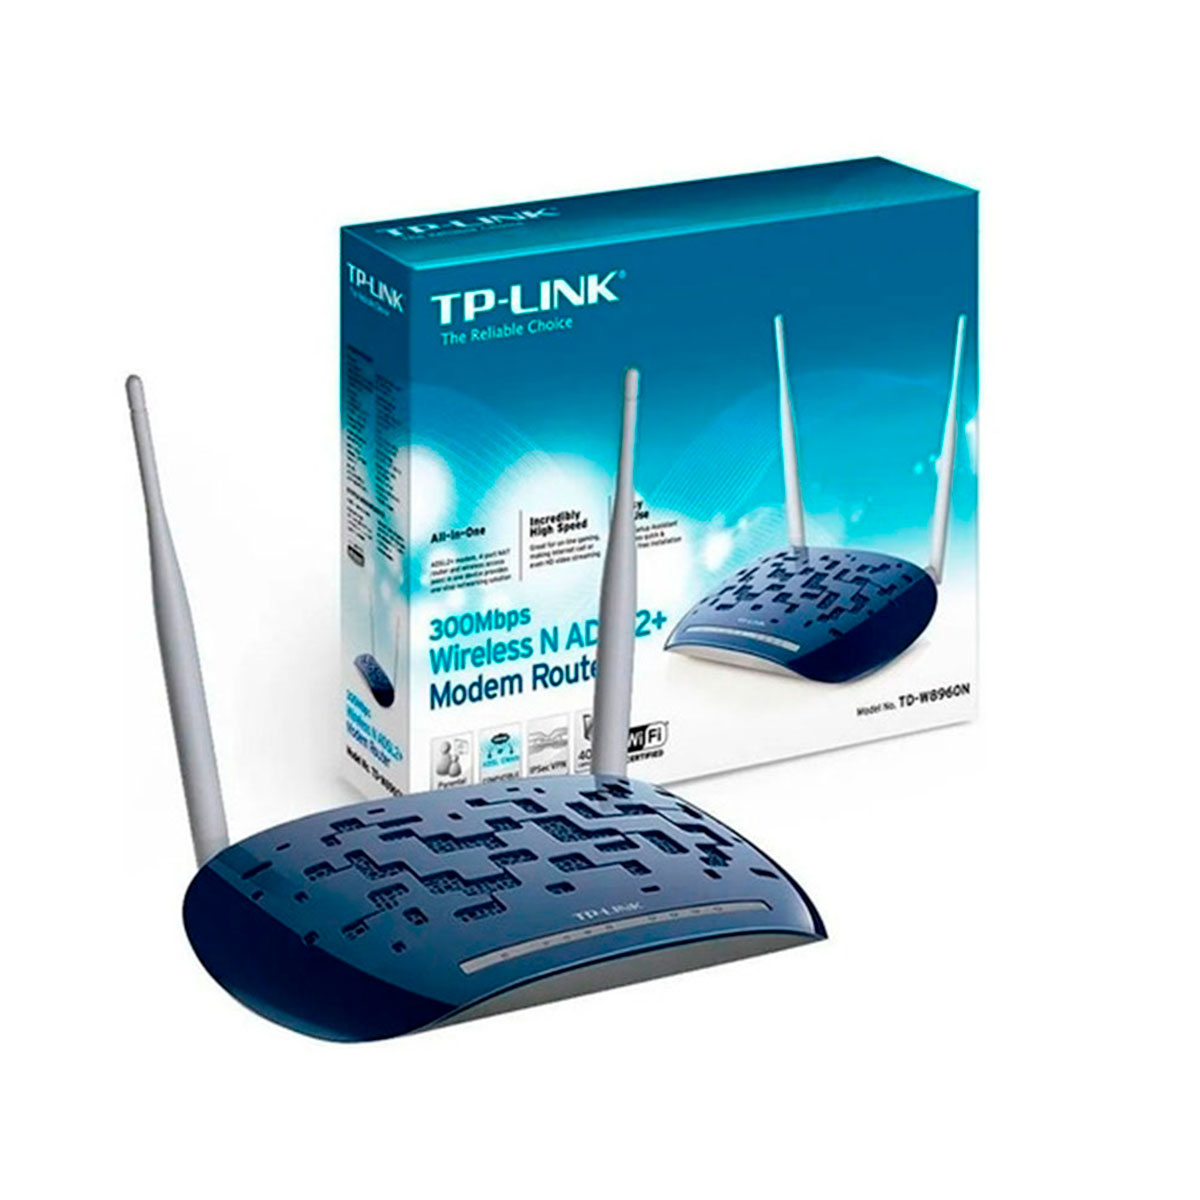 TD-W8960N TP-LINK                                                      | MODEM ROUTER TD-W8960N WIFI N ADSL2 300M